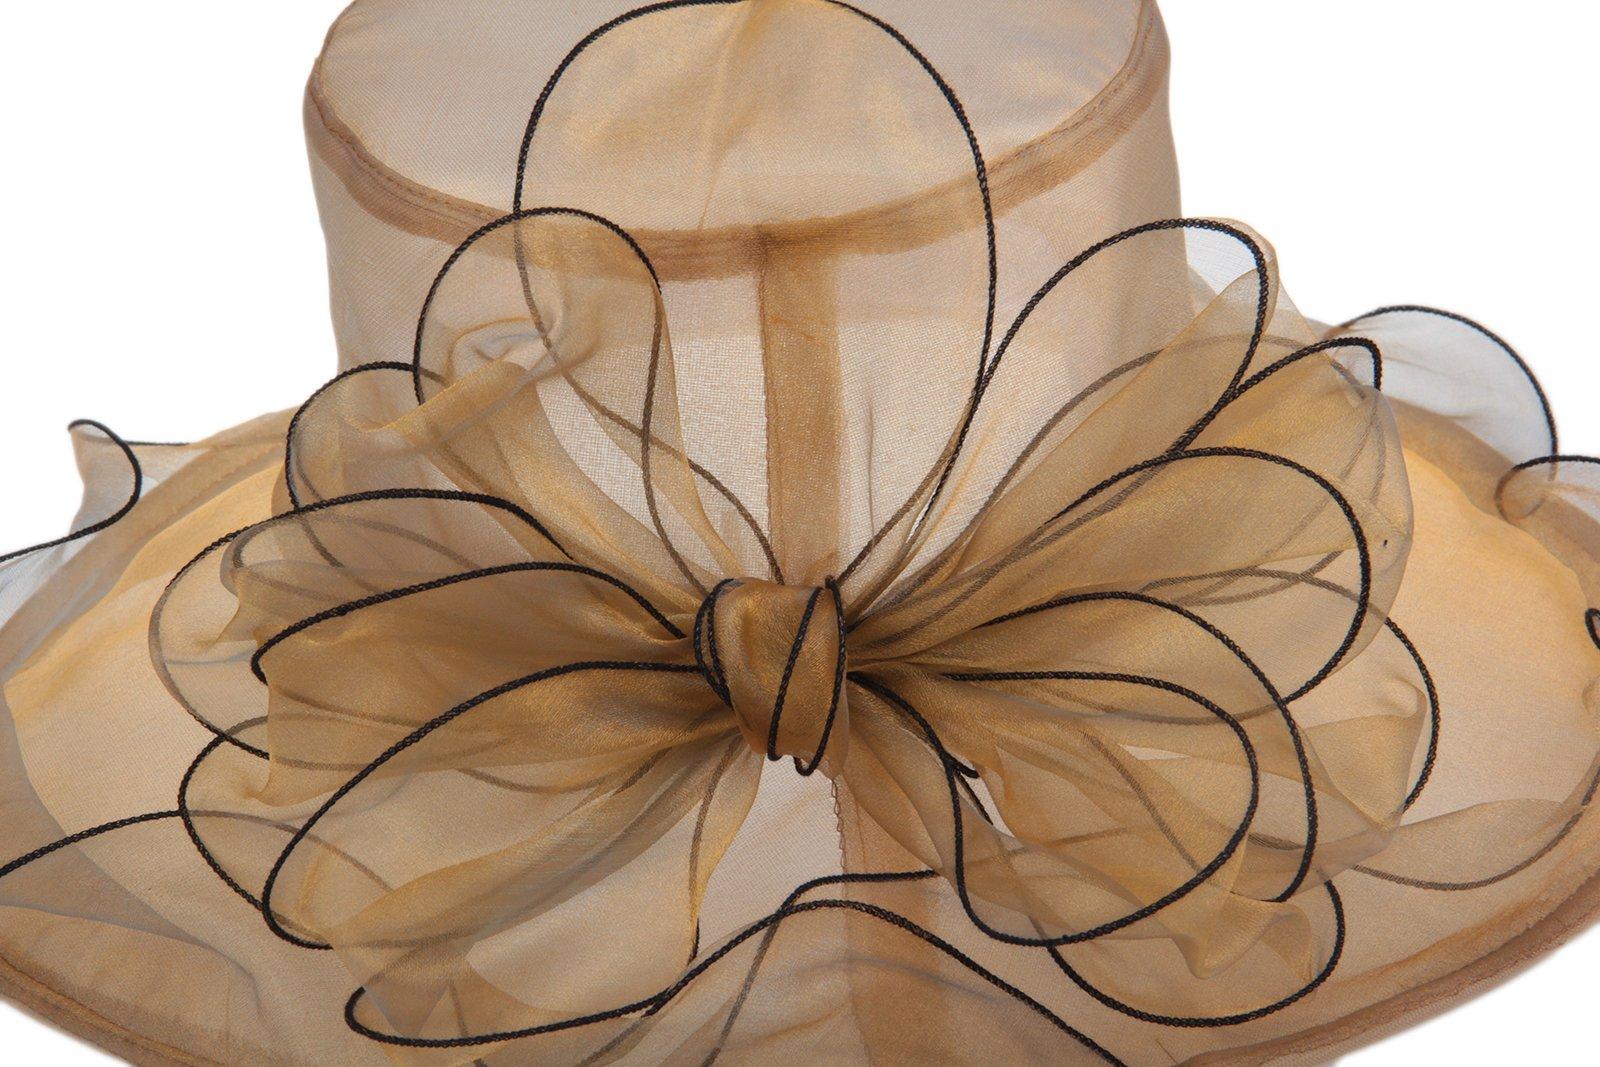 Dantiya Women's Organza Church Kentucky Derby Big Bowknot Fascinator Bridal Cap British (Gold) by Dantiya (Image #6)